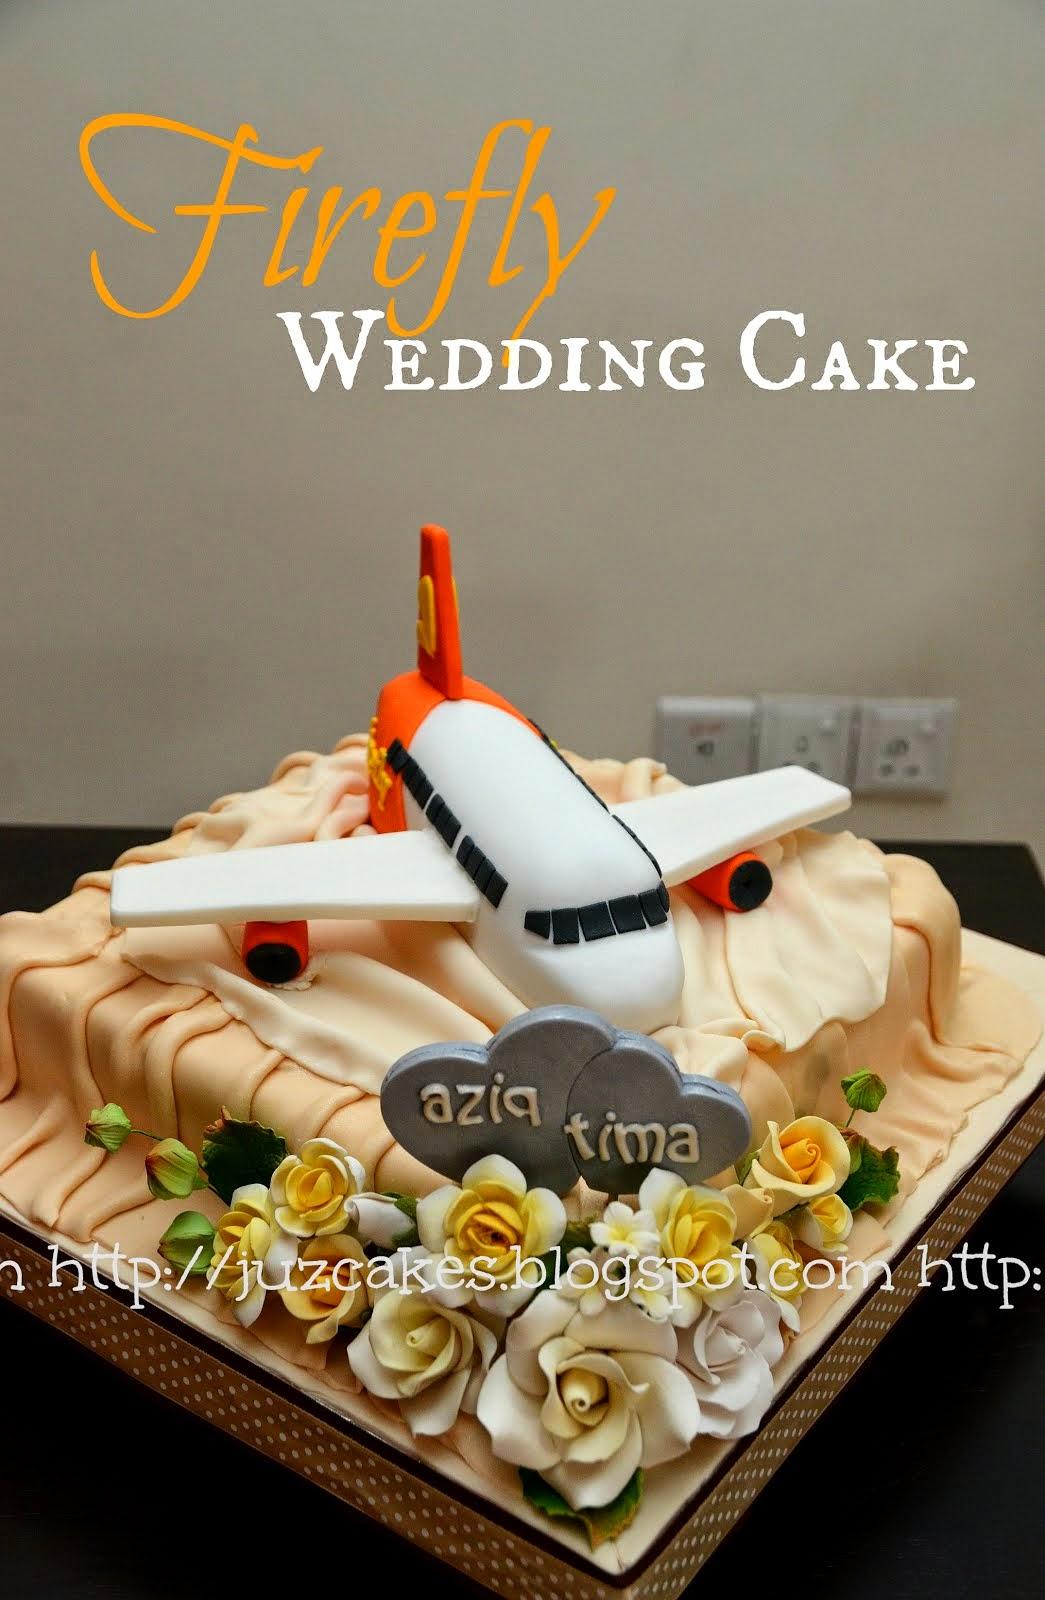 Firefly Wedding Cake